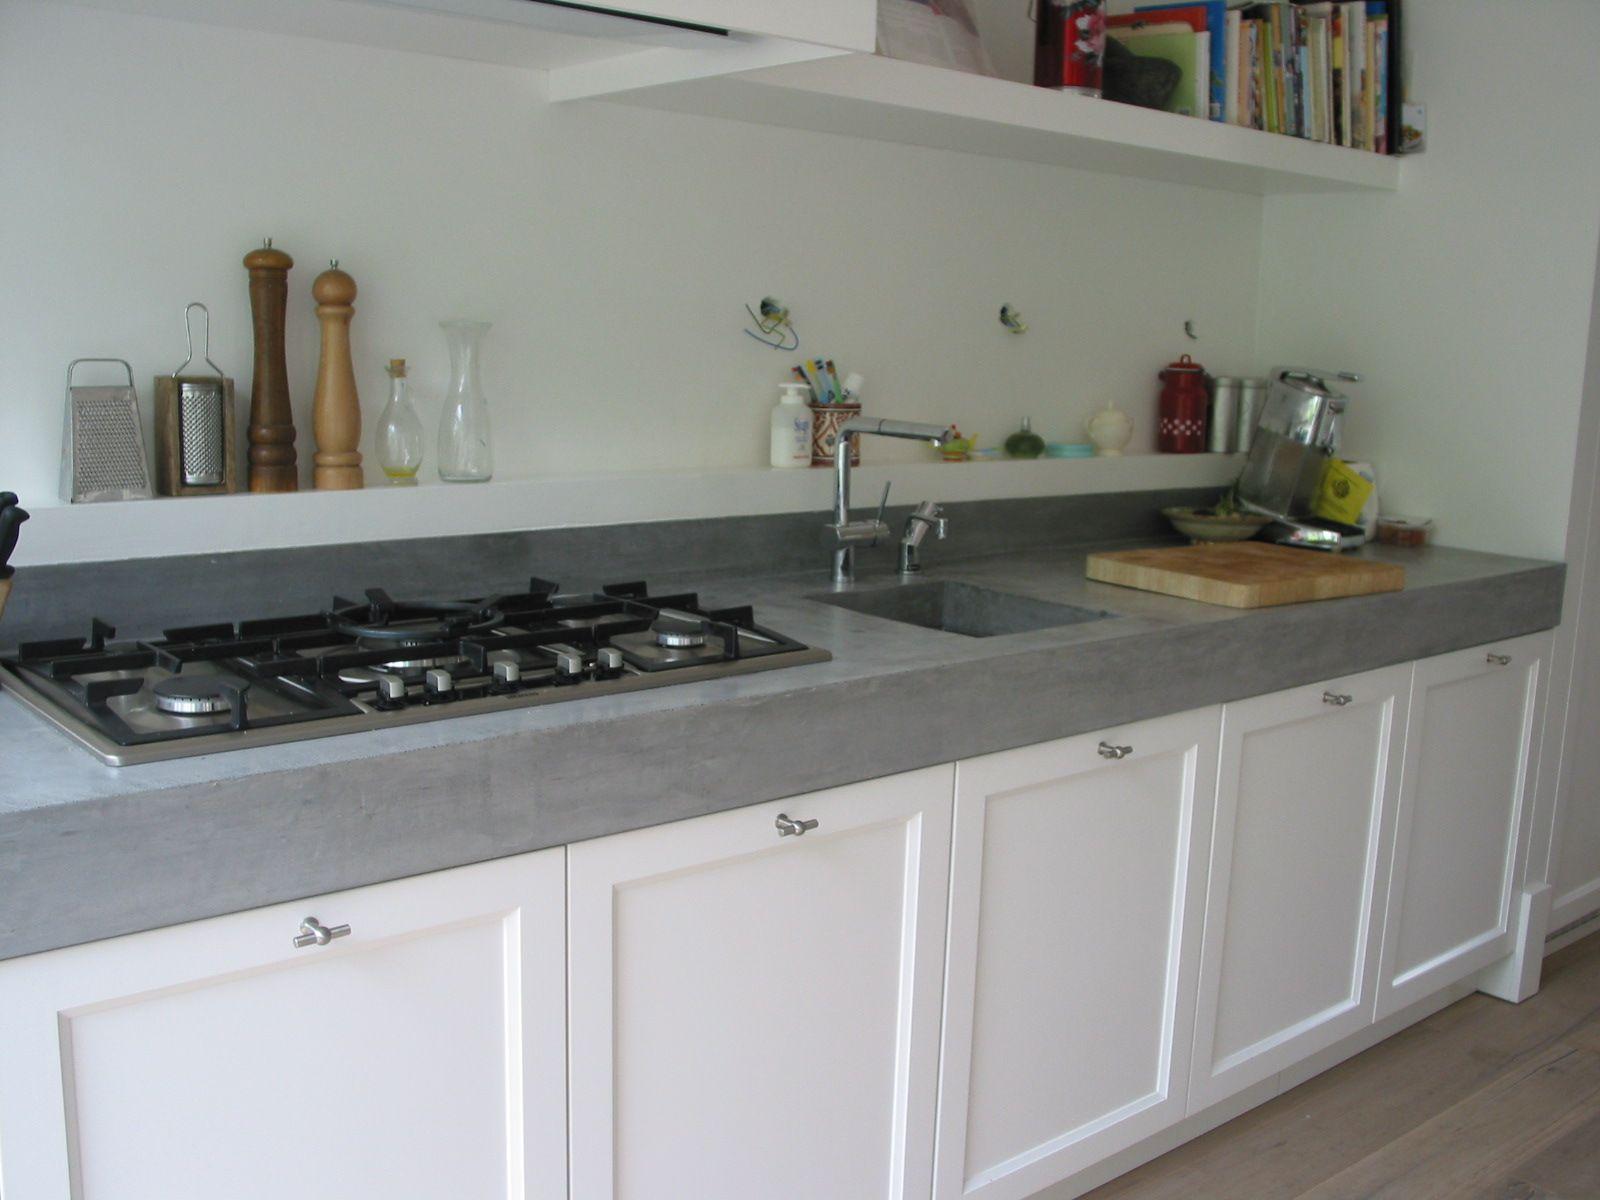 Extra Werkblad Keuken : Bloksma keukens extra diep werkblad